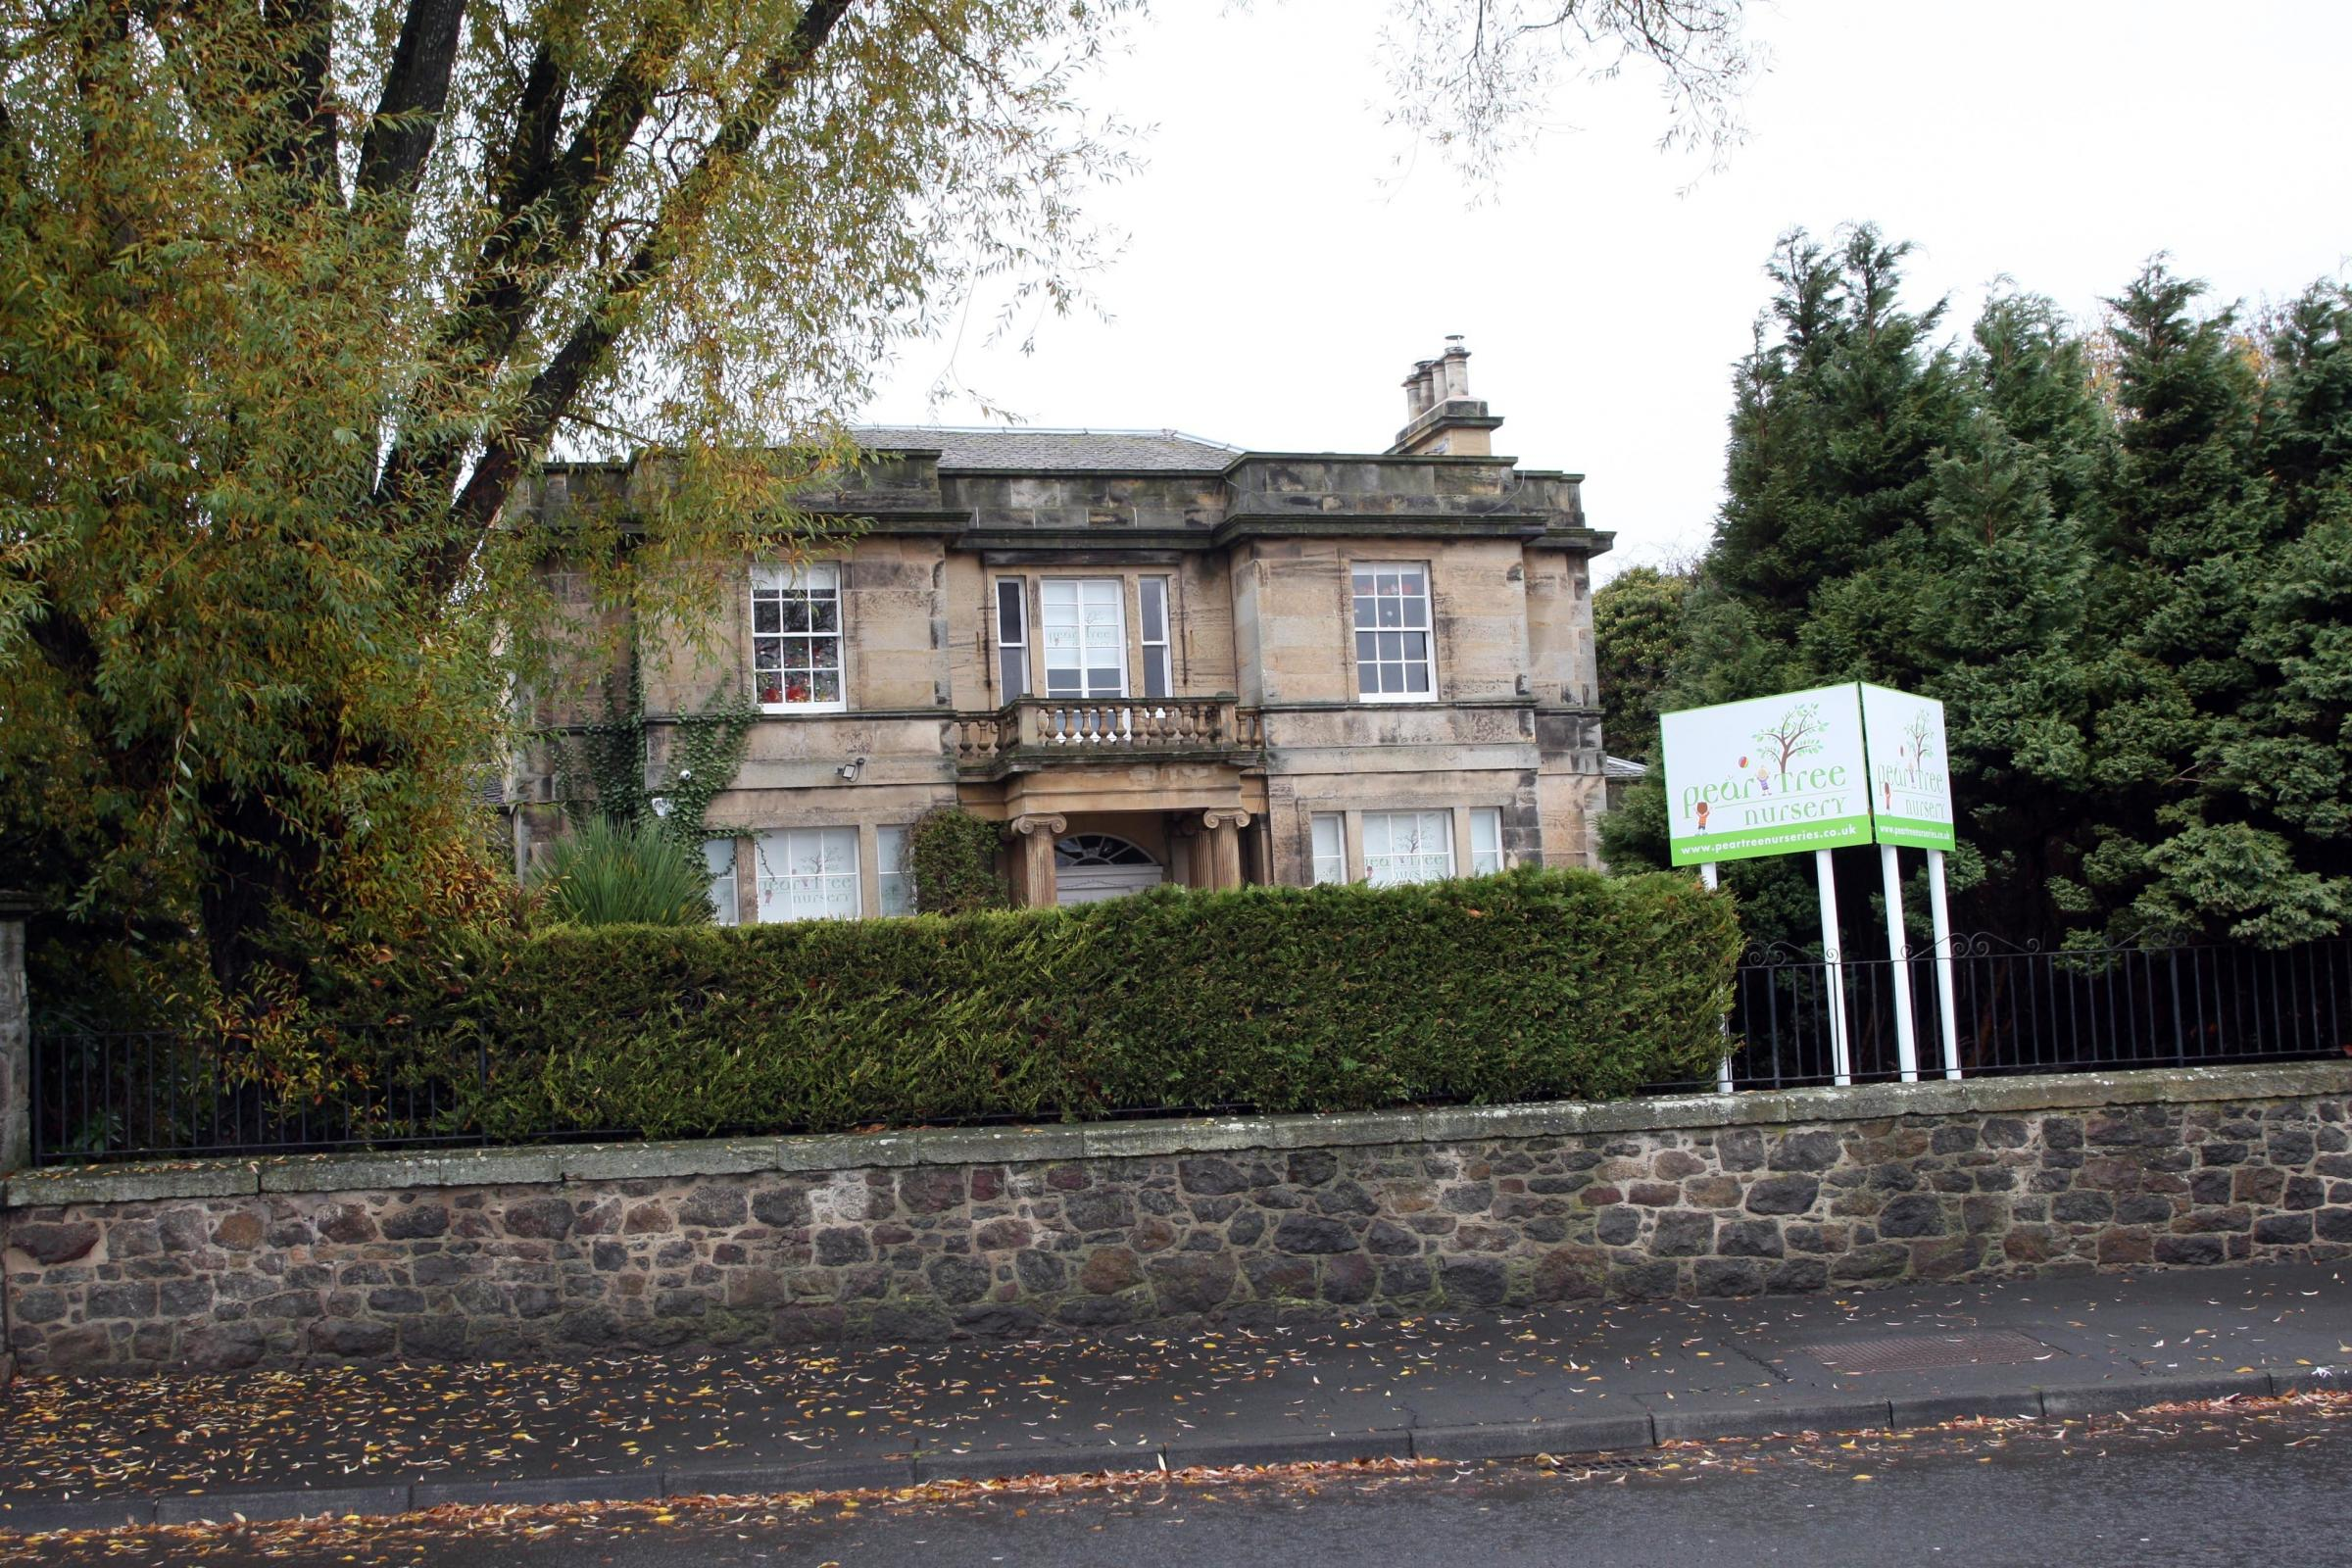 Inspectors full of praise for Haddington nursery